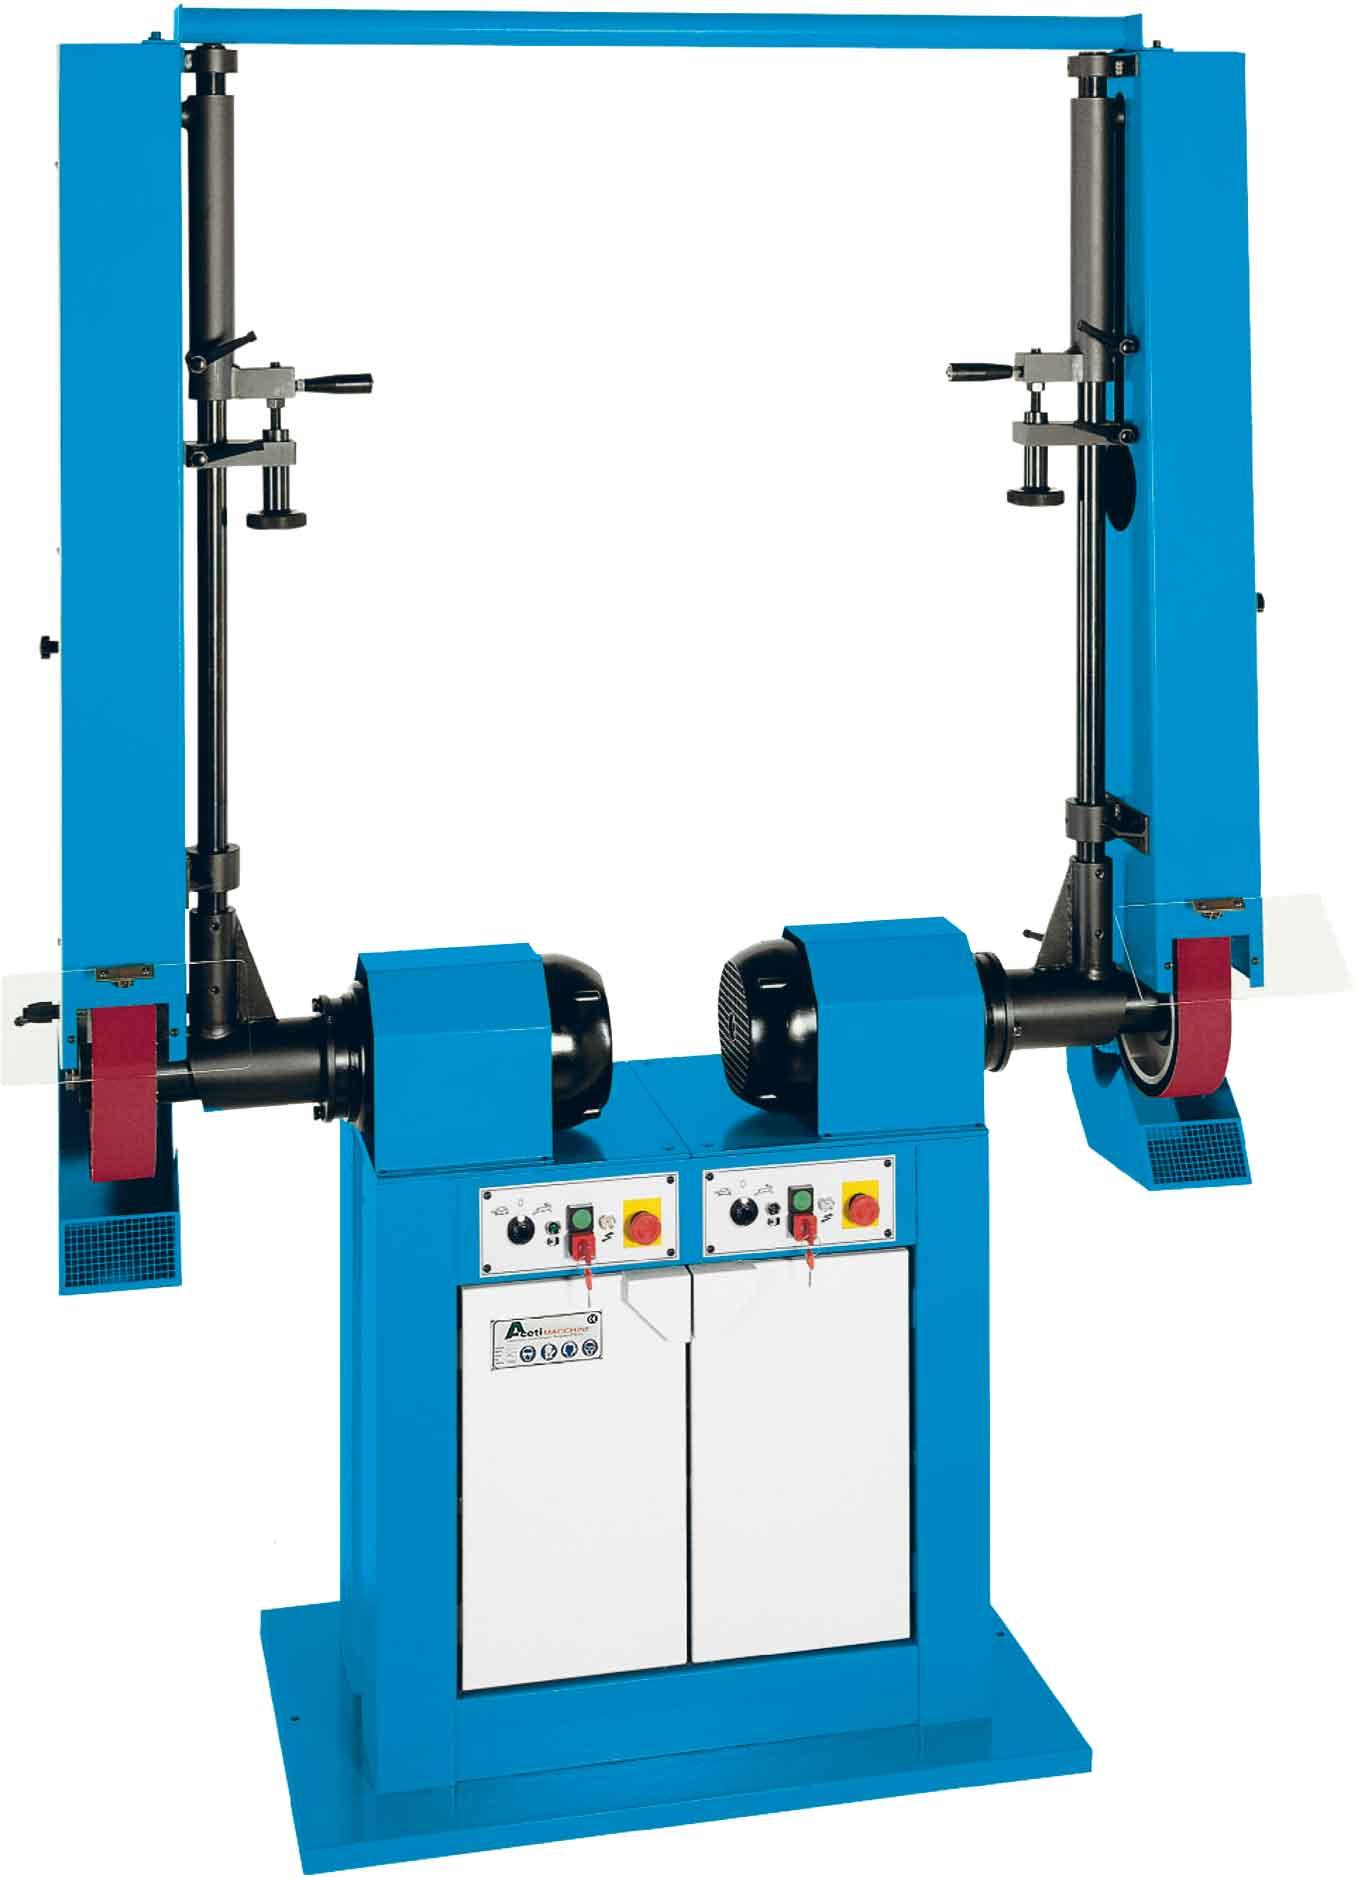 ART.58 - Belt grinding machine